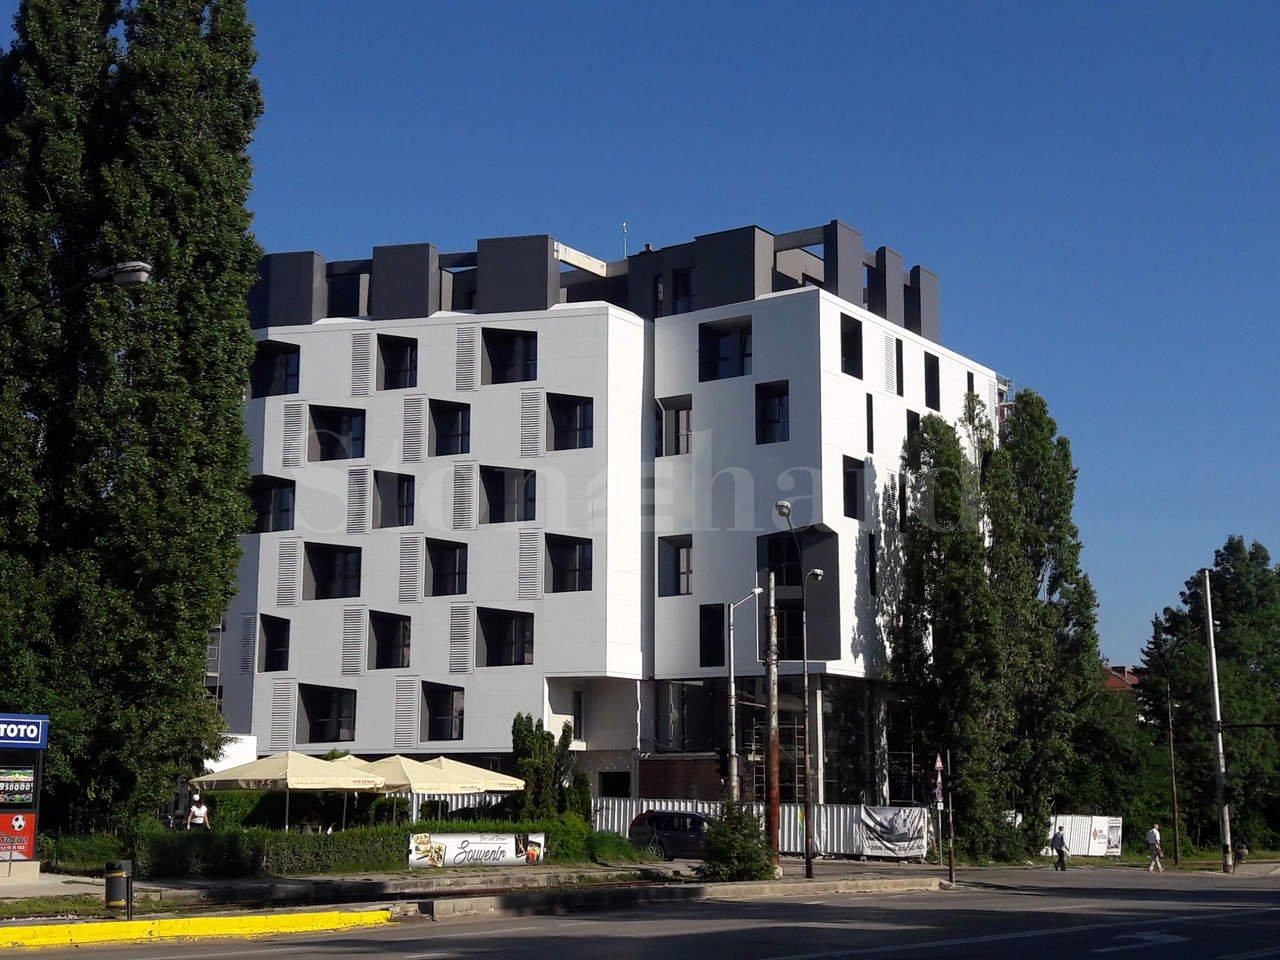 Нови апартаменти до Студентски град, Акт 16 - февруари 20191 - Stonehard